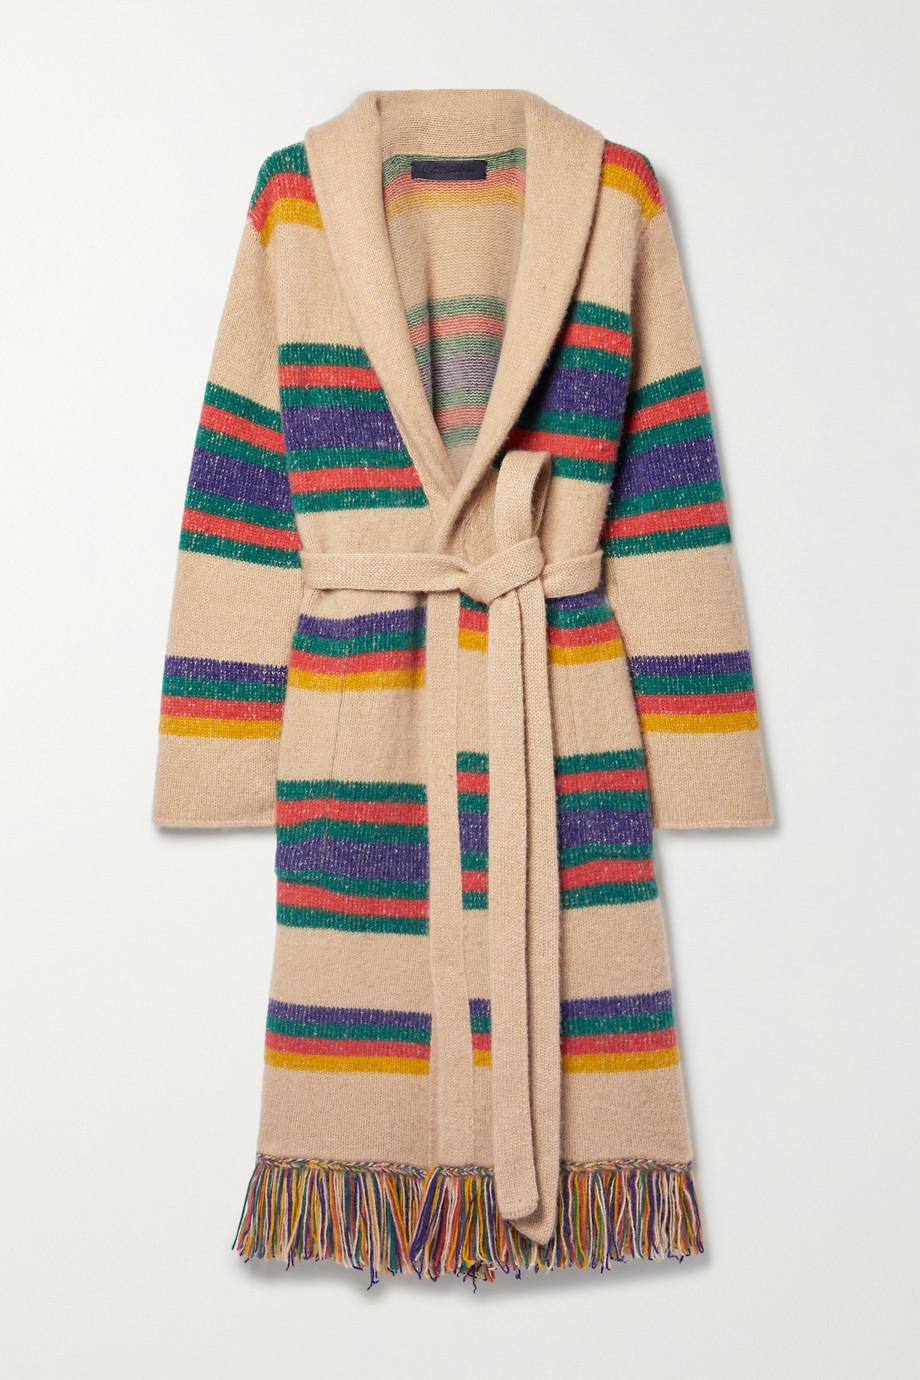 The Elder Statesman Pier fringed striped belted cashmere cardigan